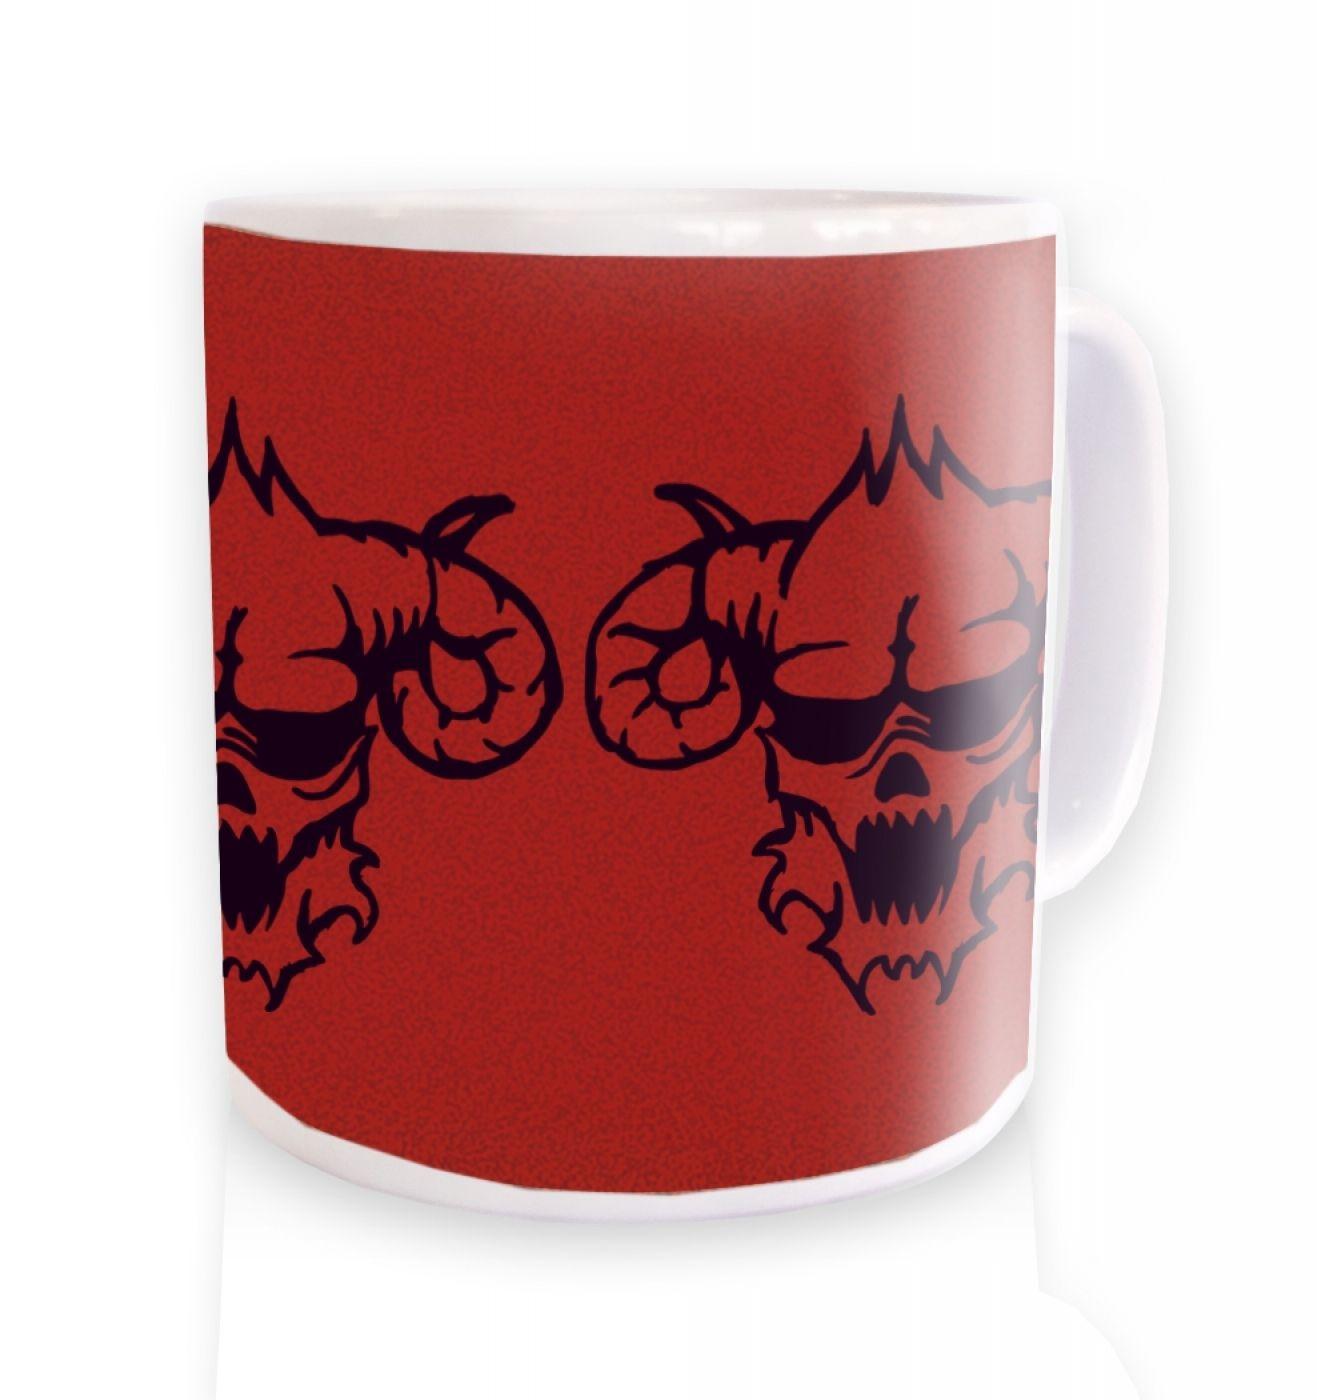 Three Black Demon's Heads ceramic coffee mug